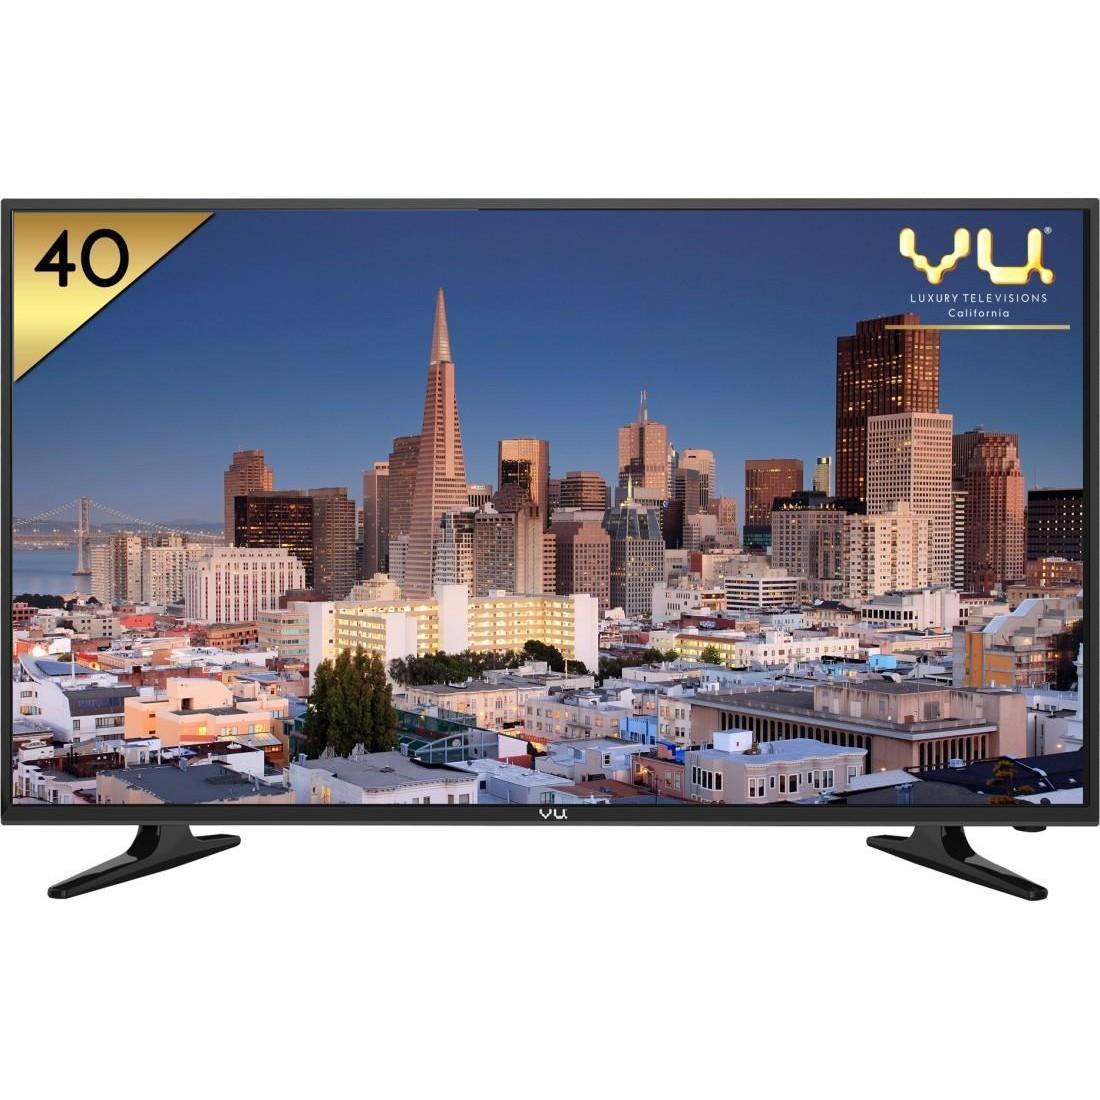 vu 40d6575 102 cm 40 led tv full hd reviews price. Black Bedroom Furniture Sets. Home Design Ideas